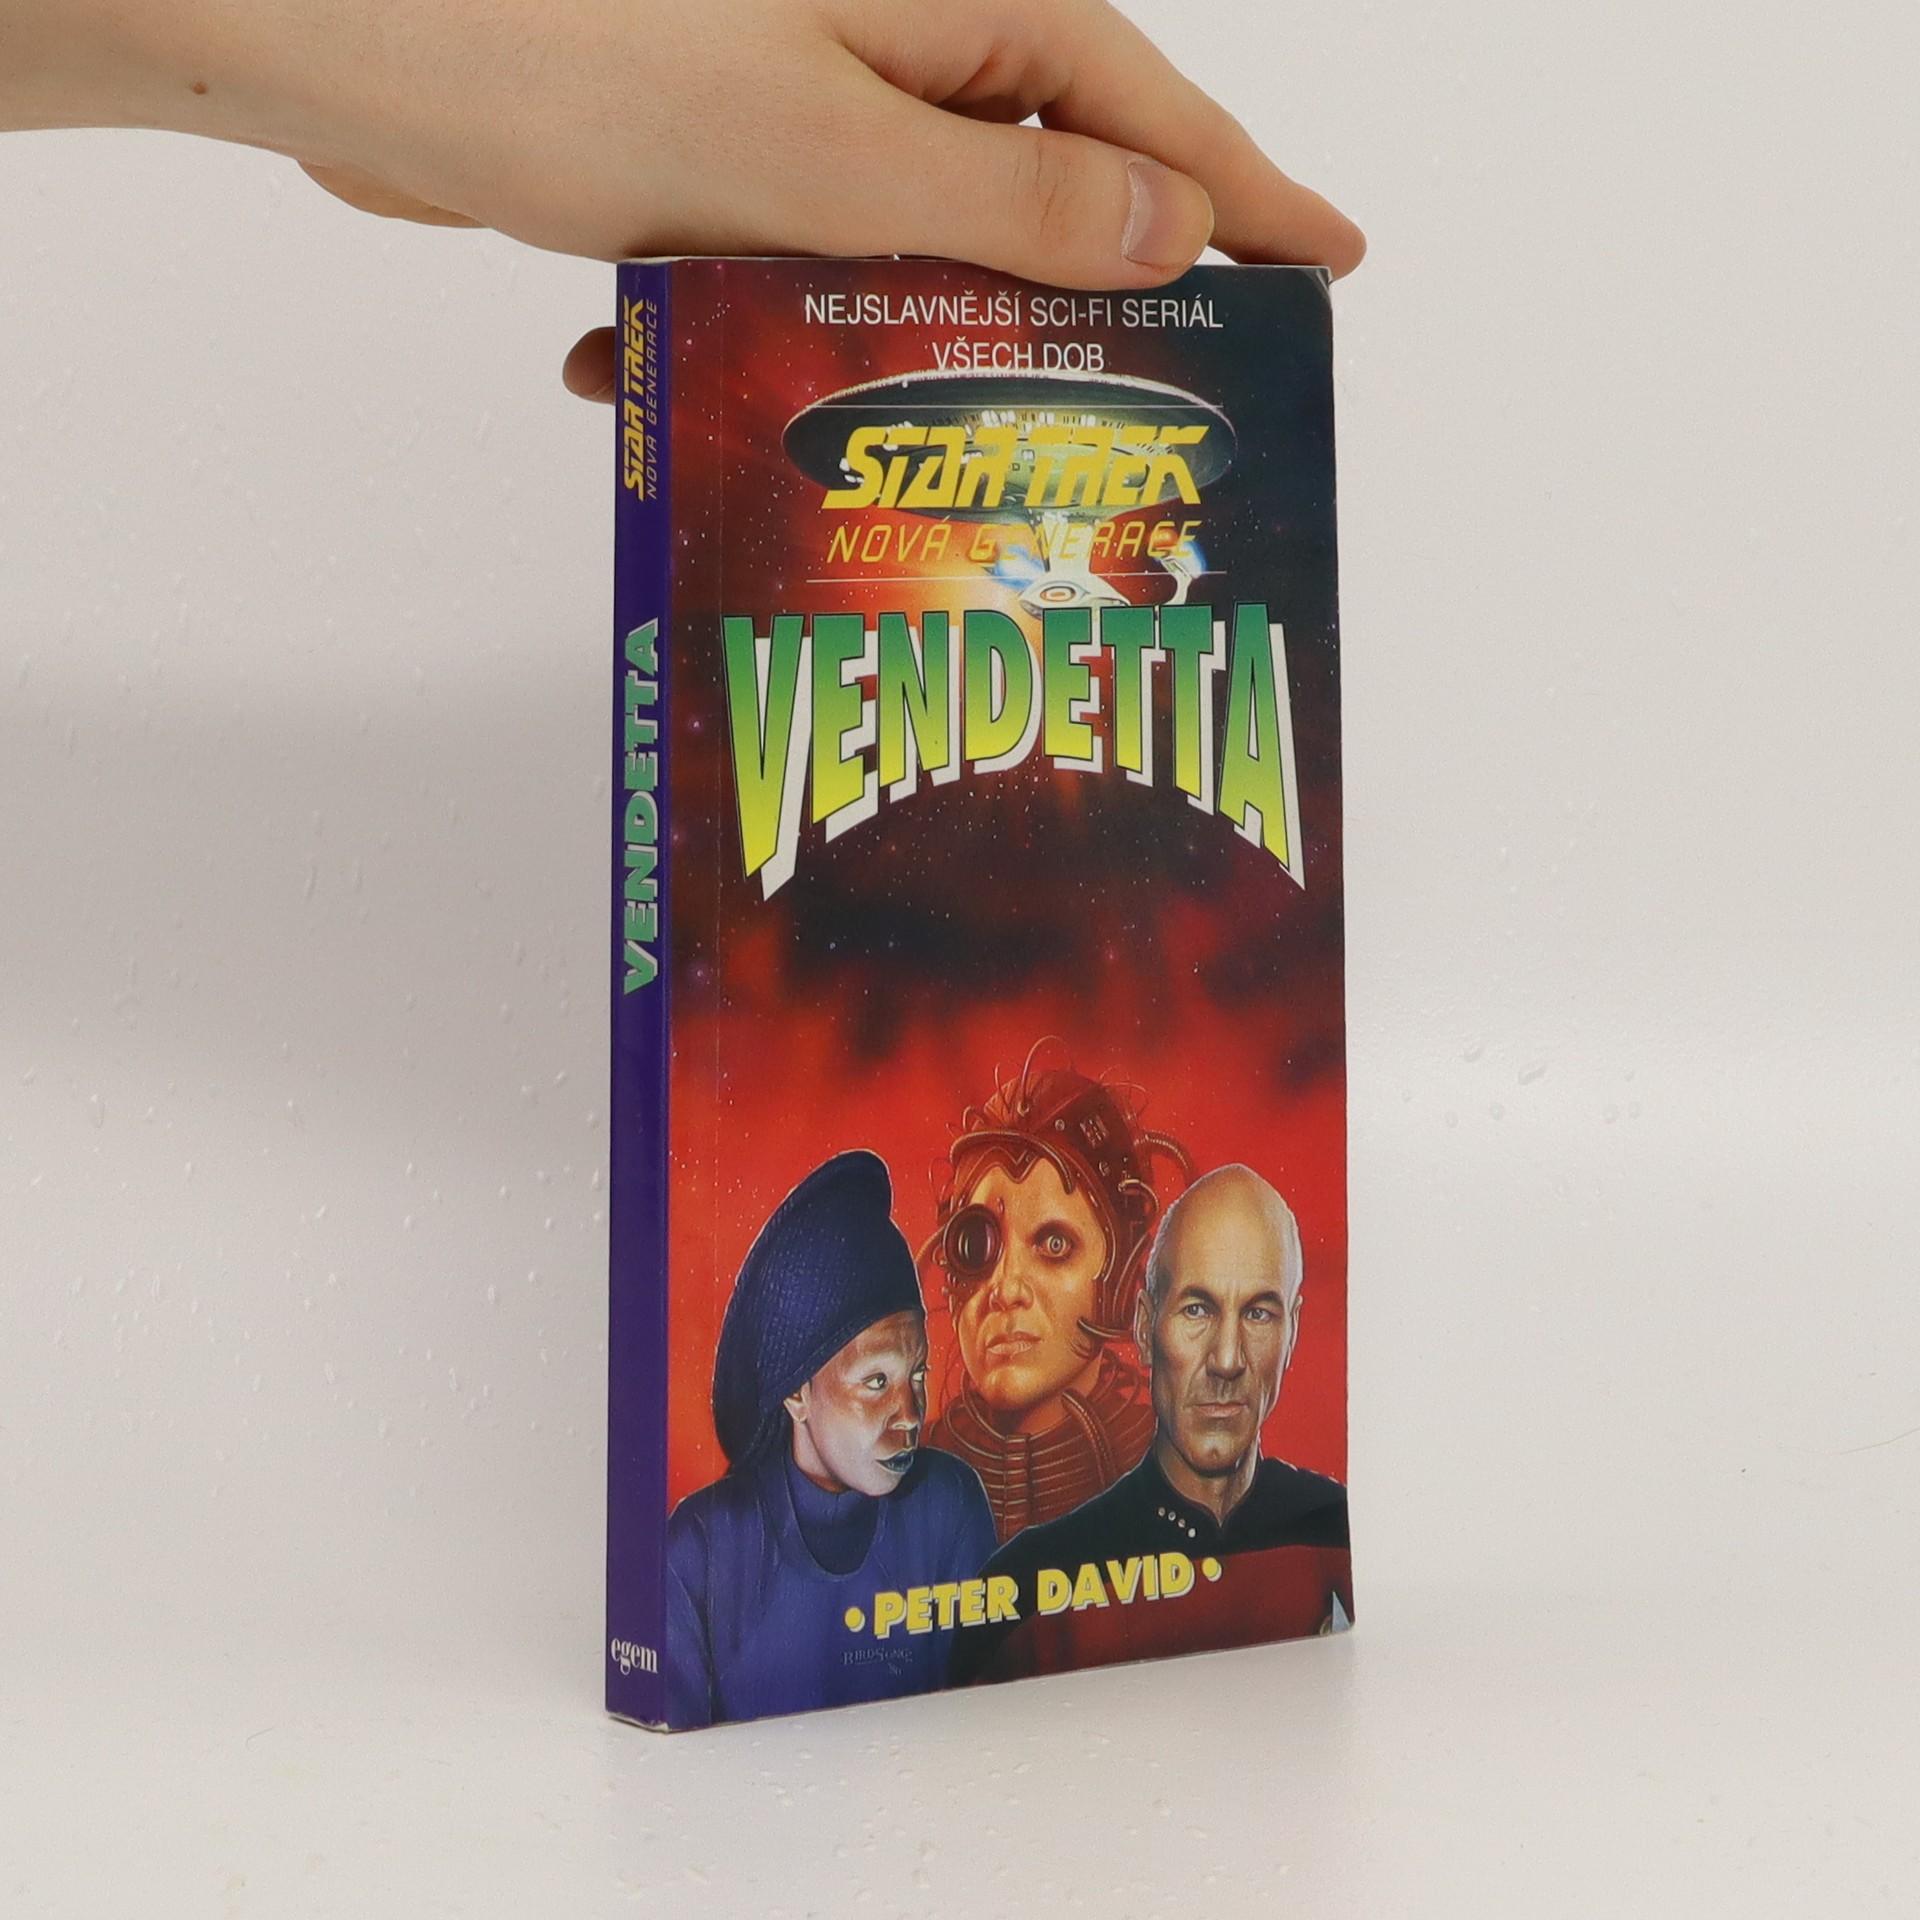 antikvární kniha Vendetta, 1995